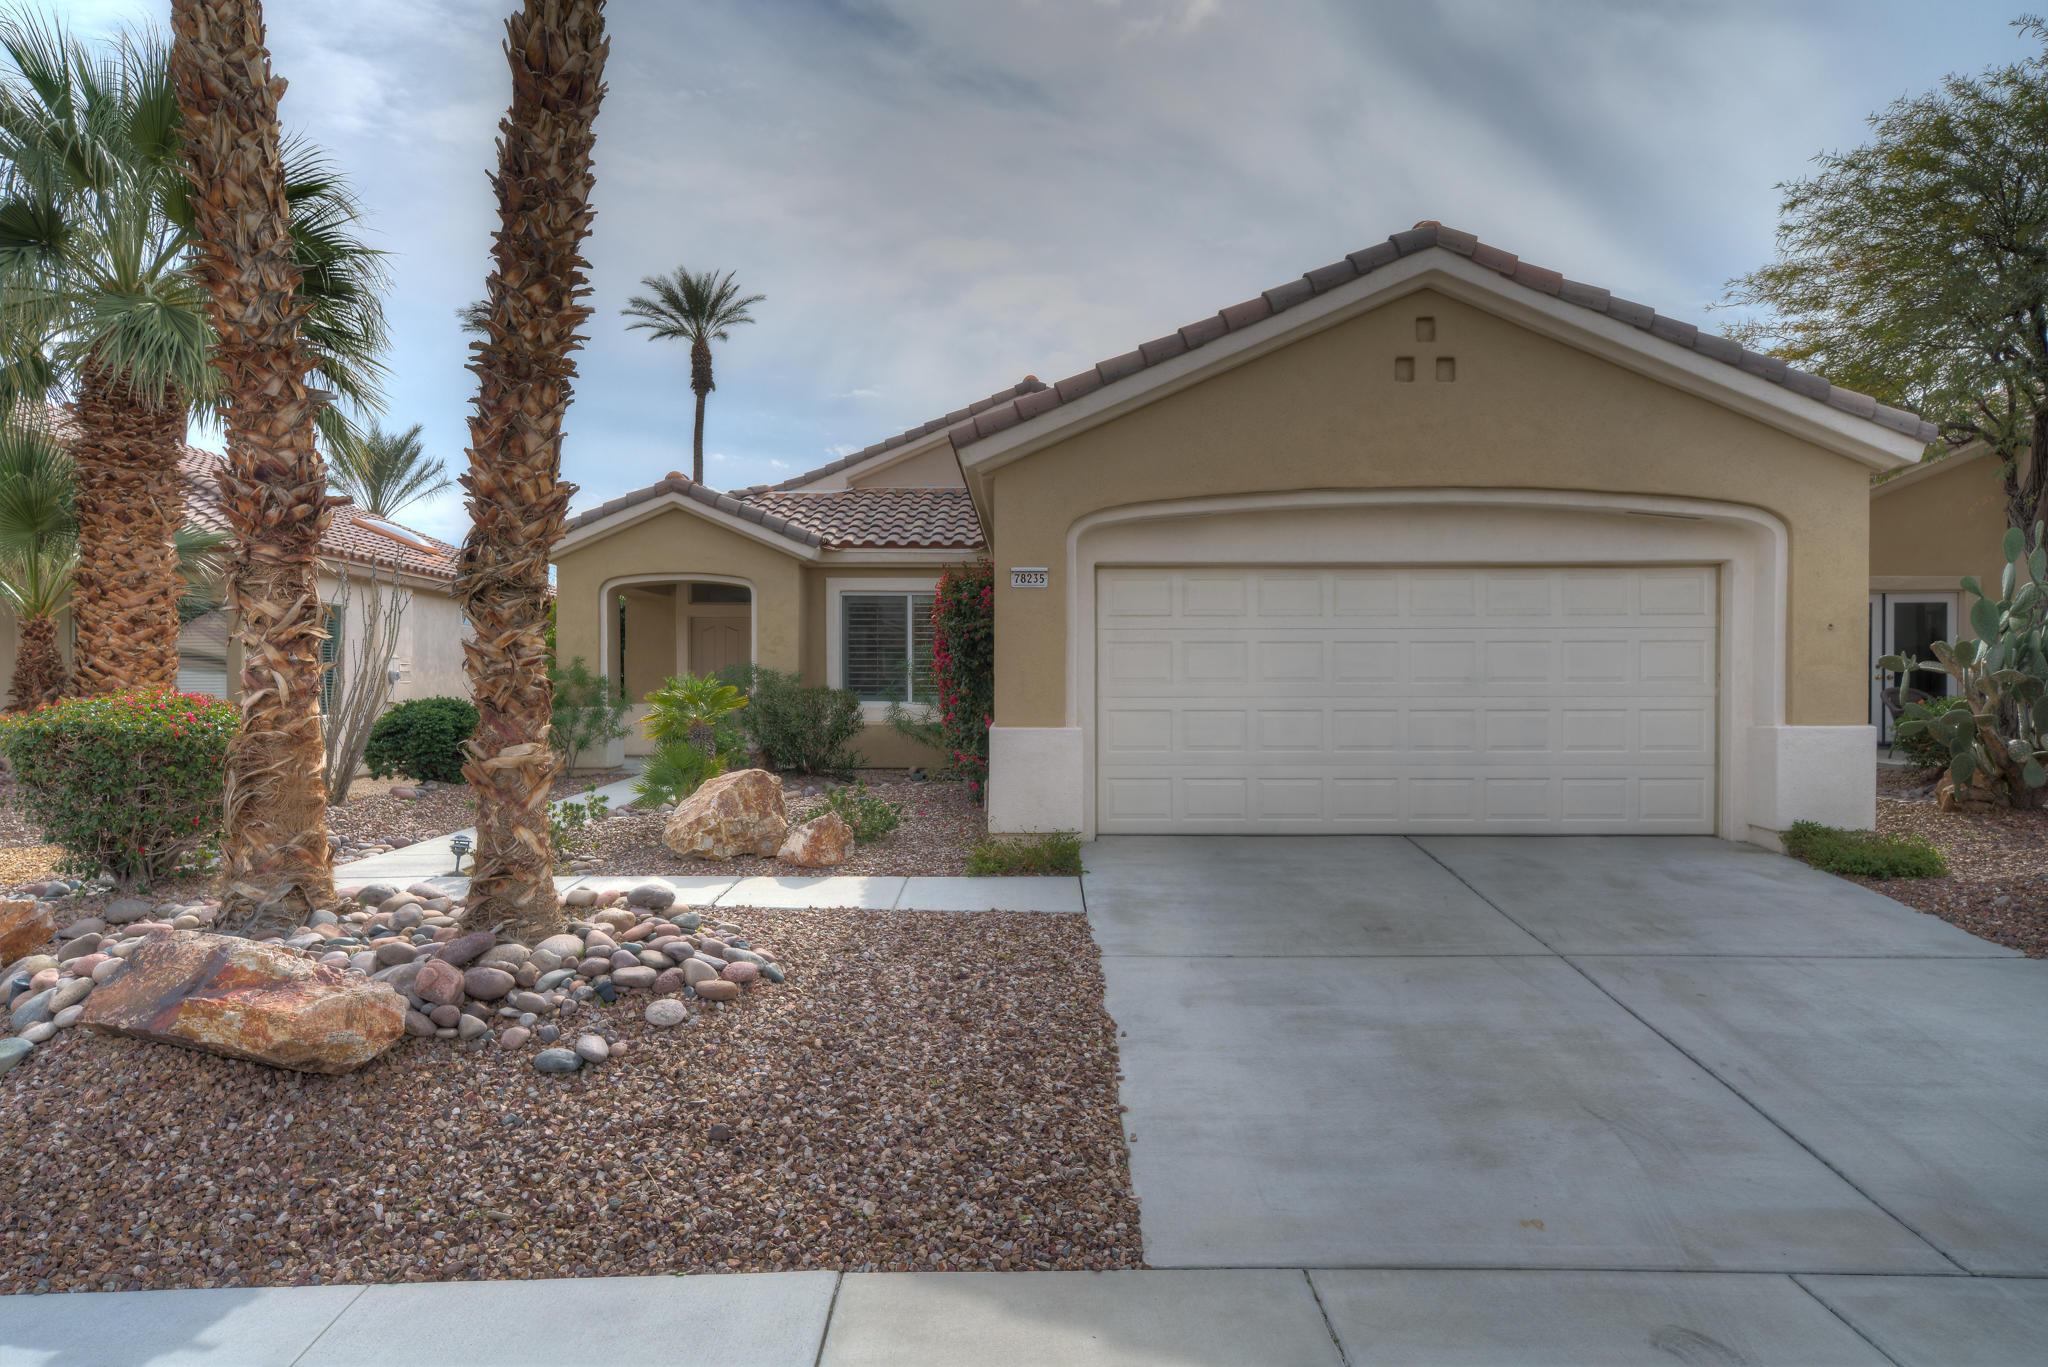 Photo of 78235 Estancia Drive, Palm Desert, CA 92211